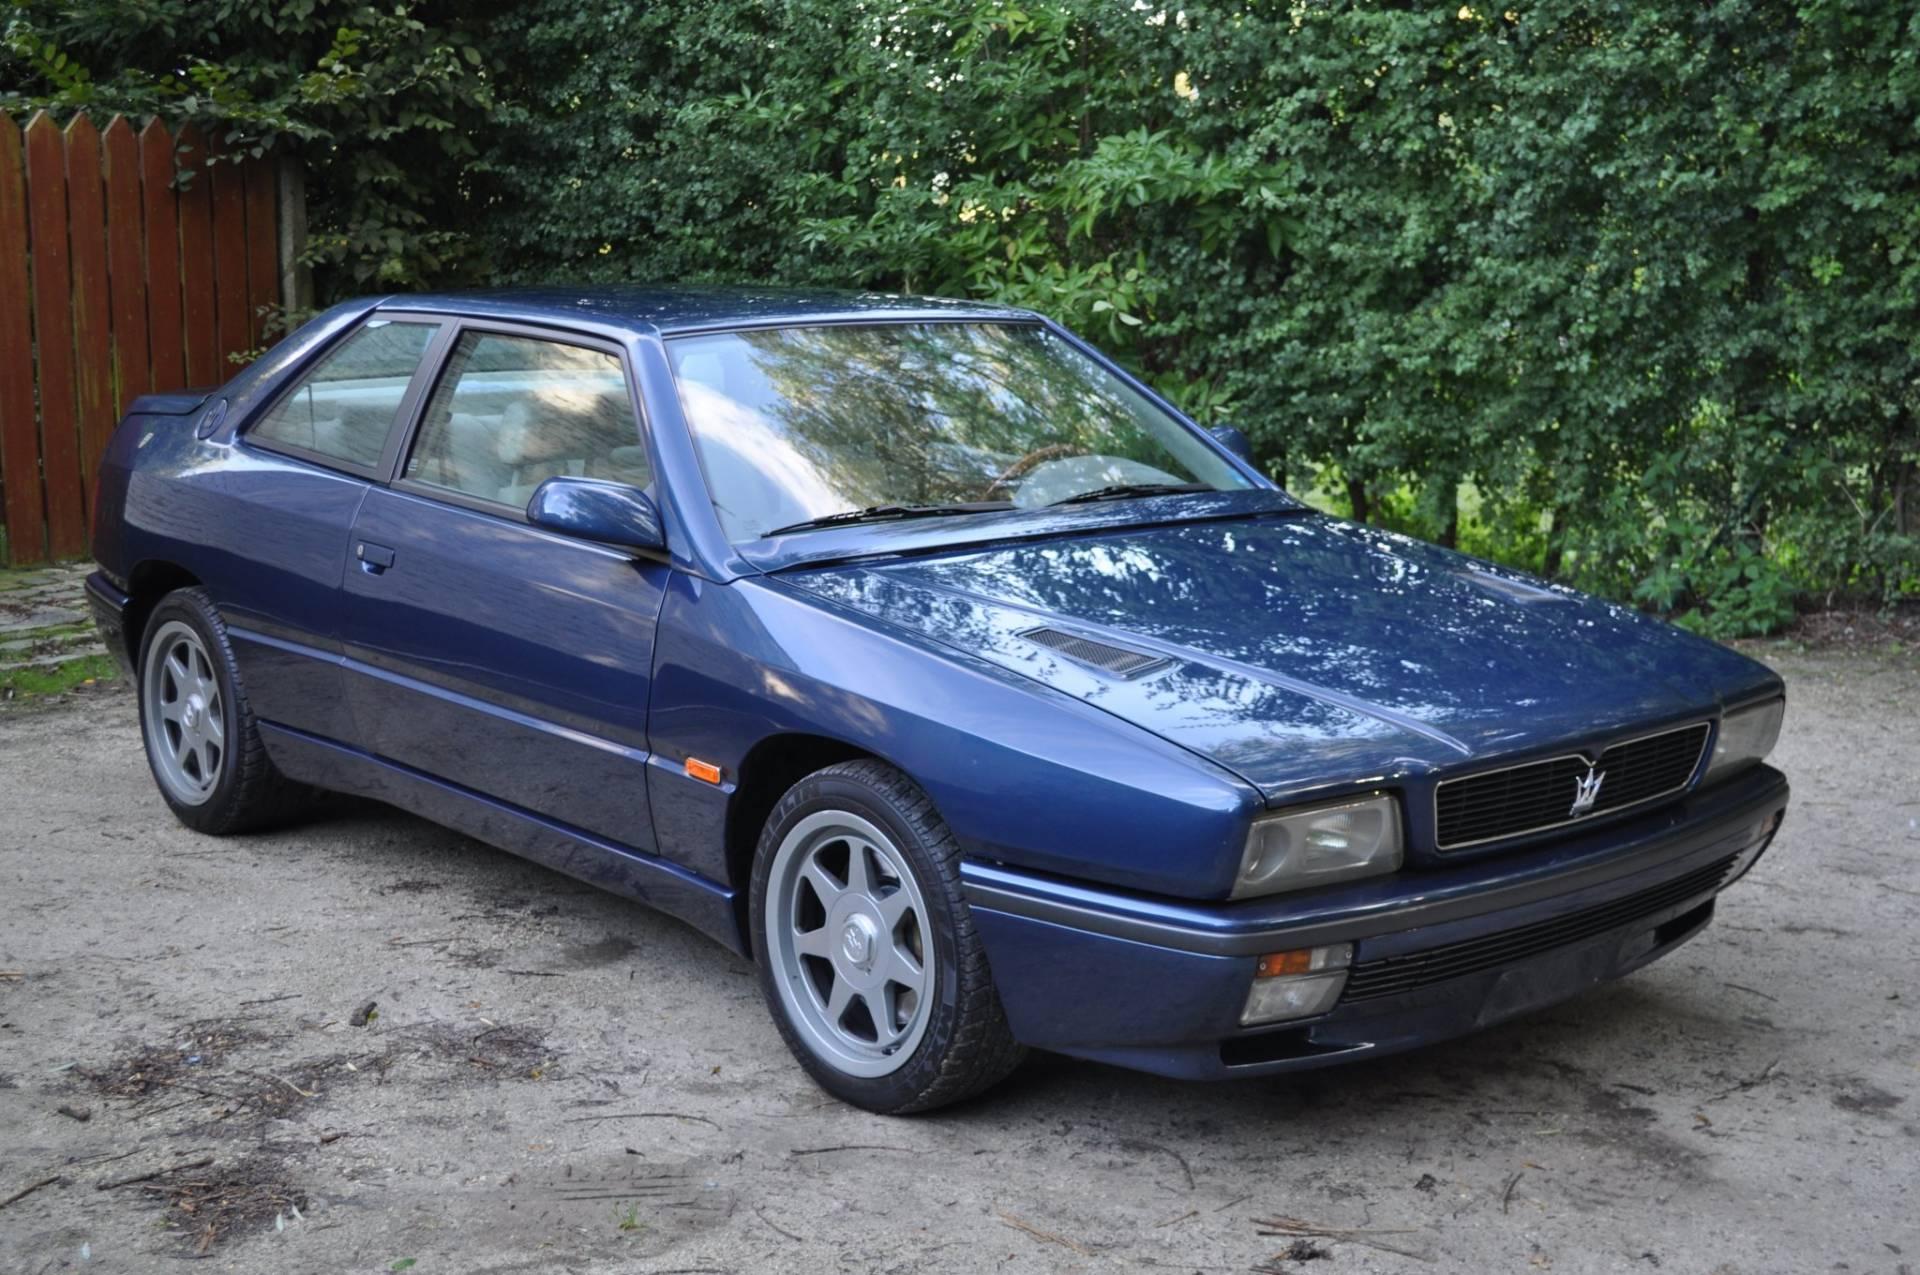 Maserati Ghibli 2.0 (1994) en vente - Classic Trader